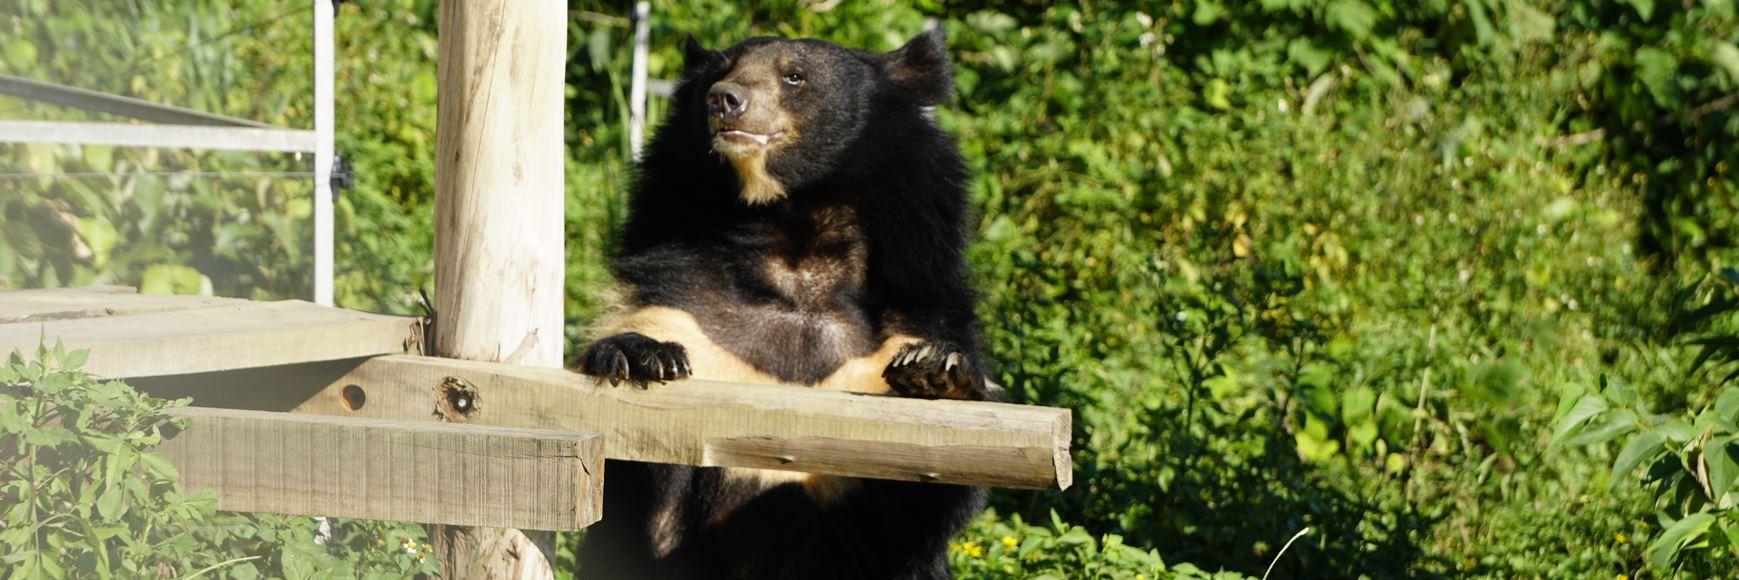 Happy rescued bear